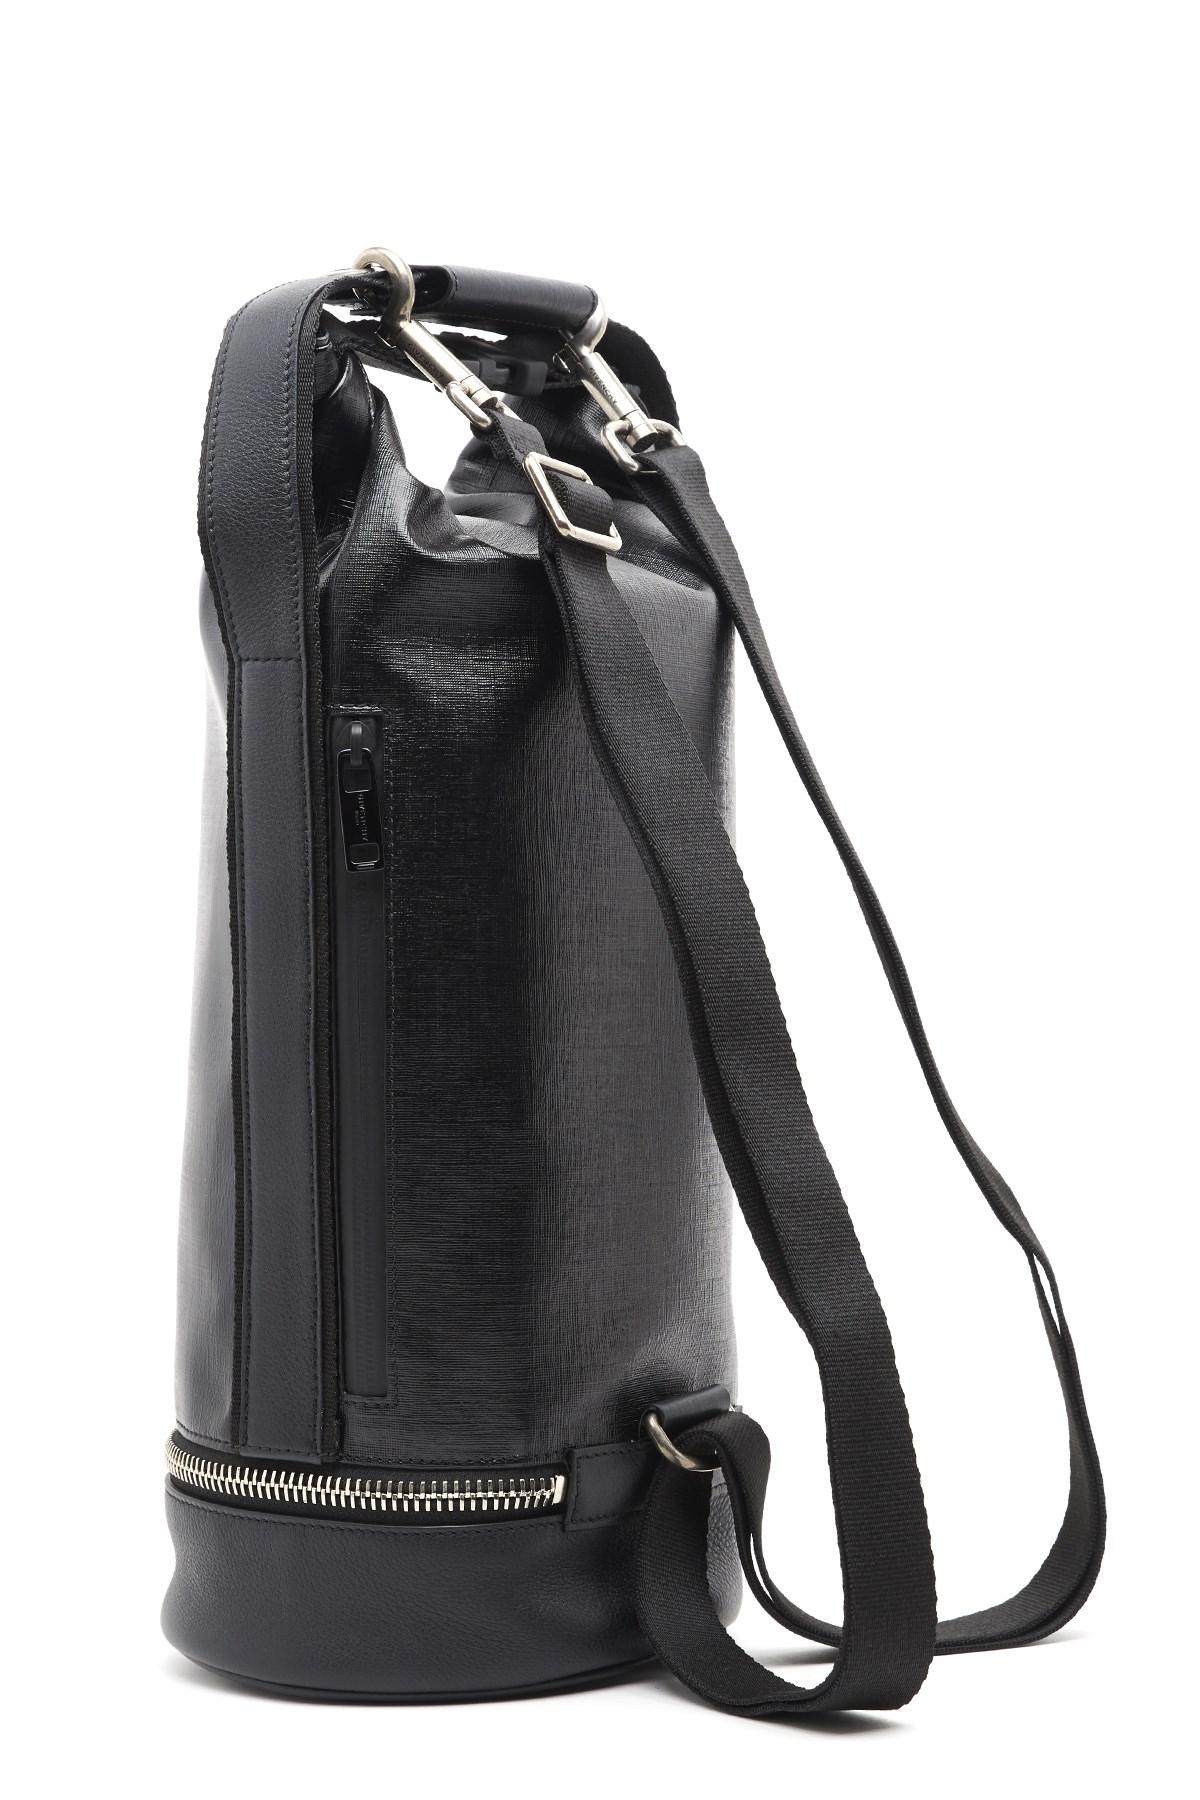 22a132693601 givenchy  Jaw  crossbody bag available on julian-fashion.com - 62180